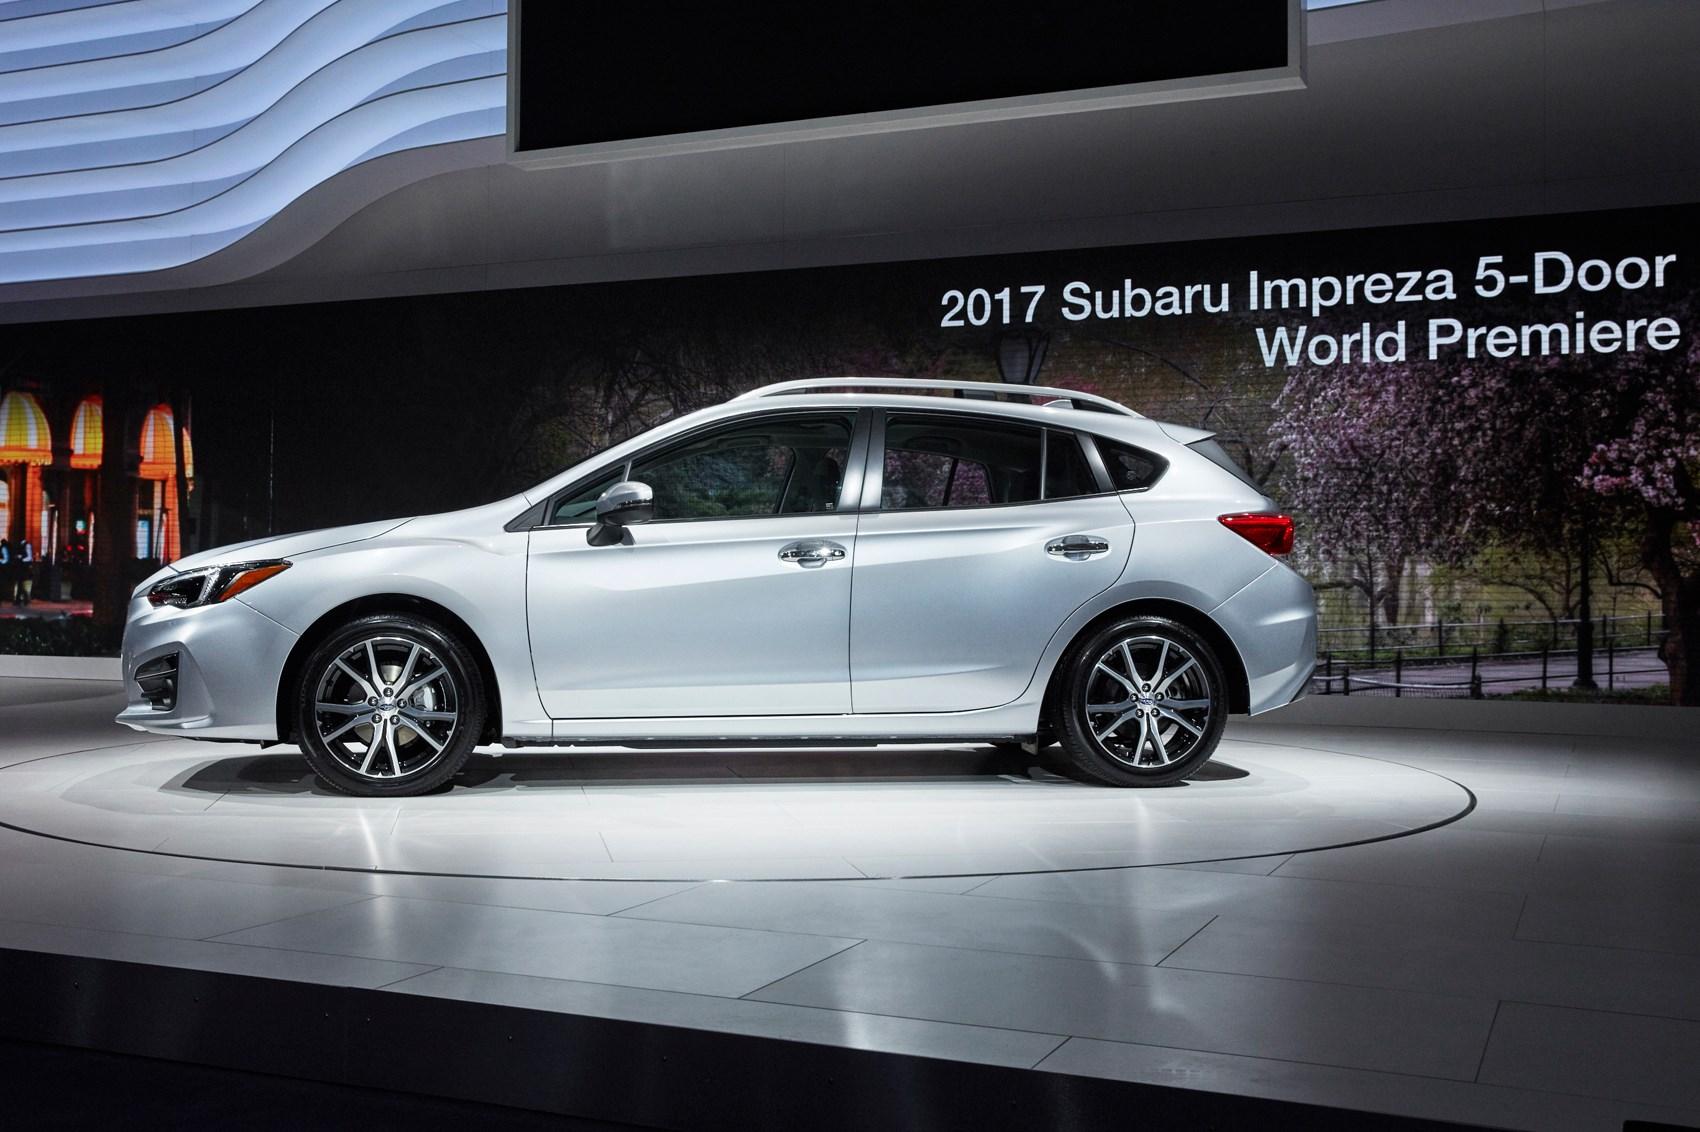 New Subaru Impreza will appear on the market in 2017 58